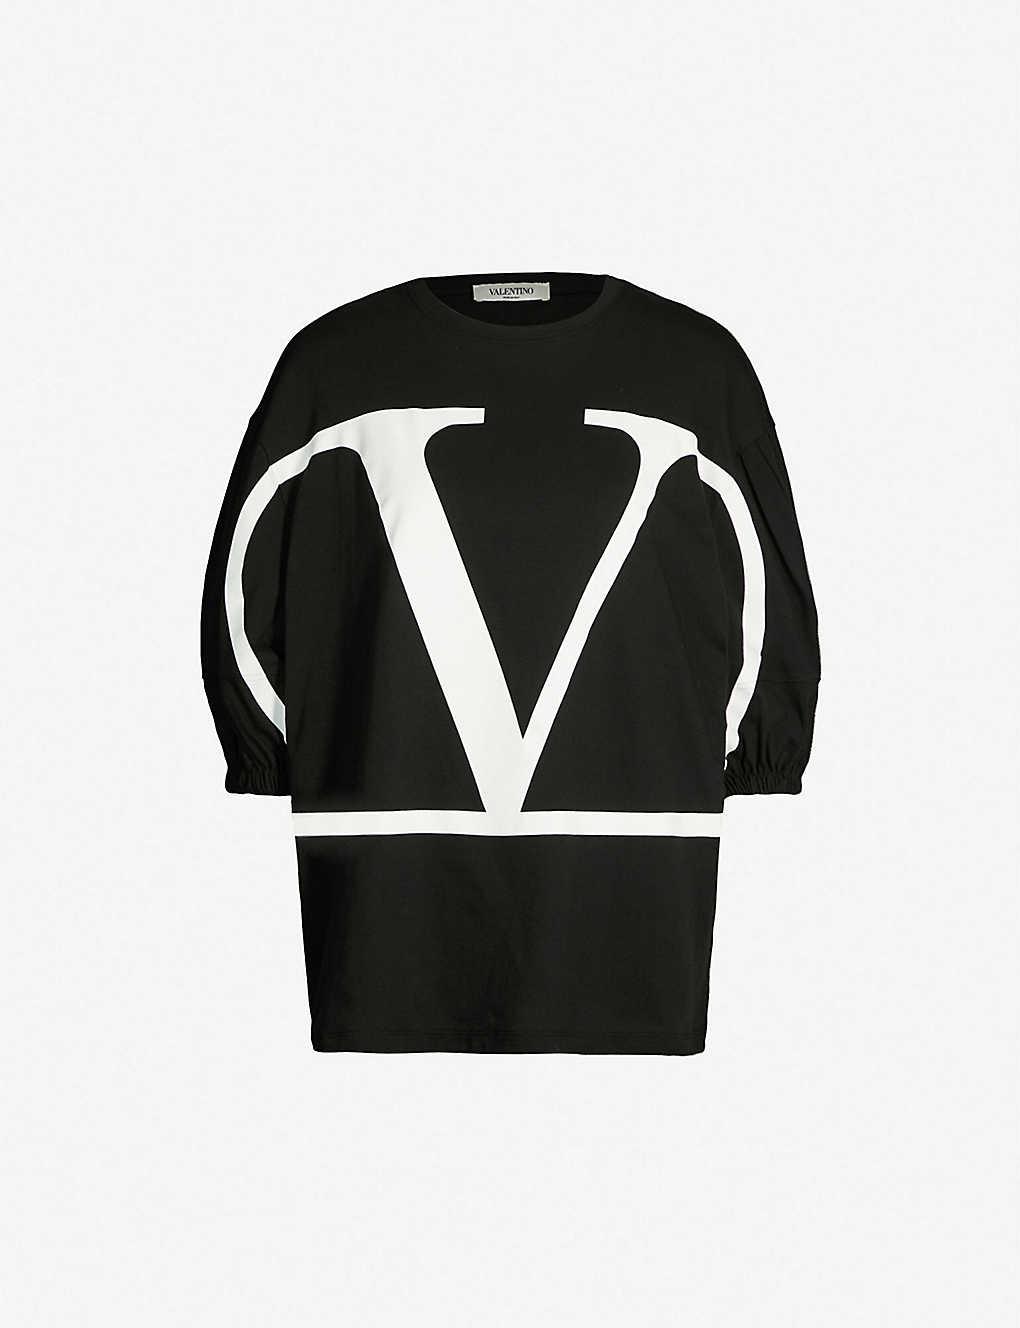 e0c89b24 VALENTINO - Deconstructed VLogo-print cotton-jersey T-shirt | Selfridges.com